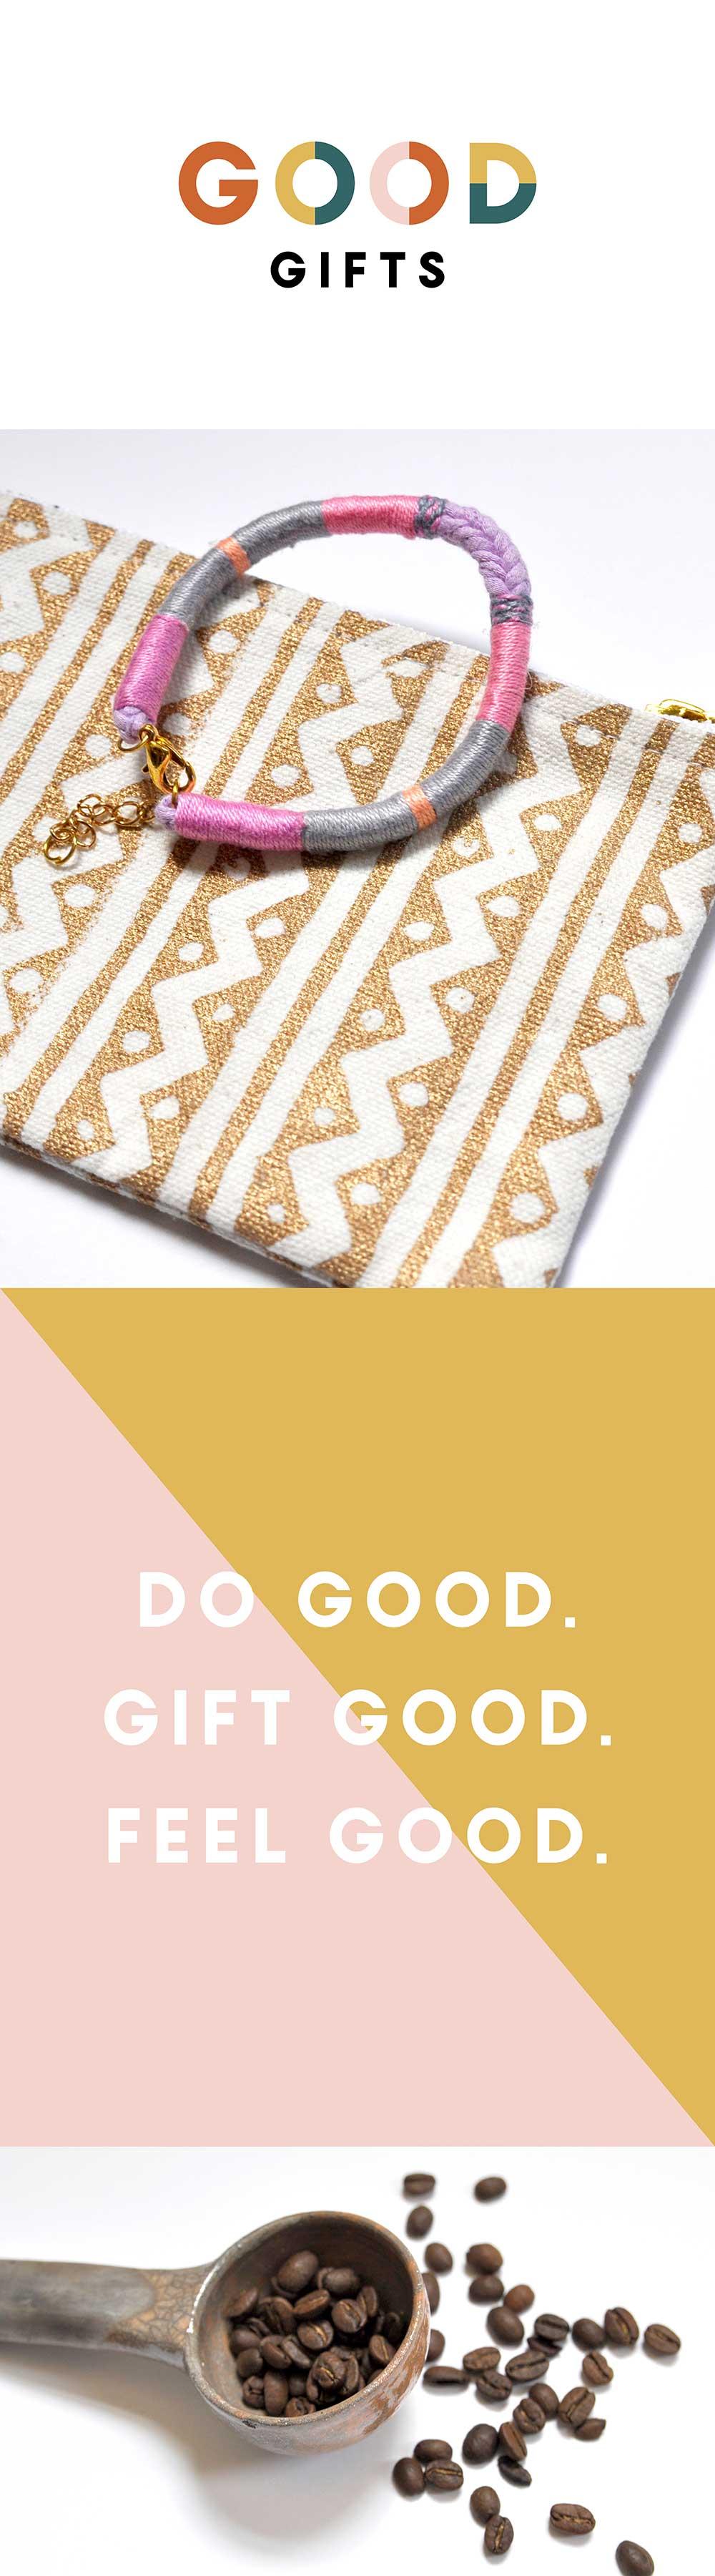 Good Gifts Branding